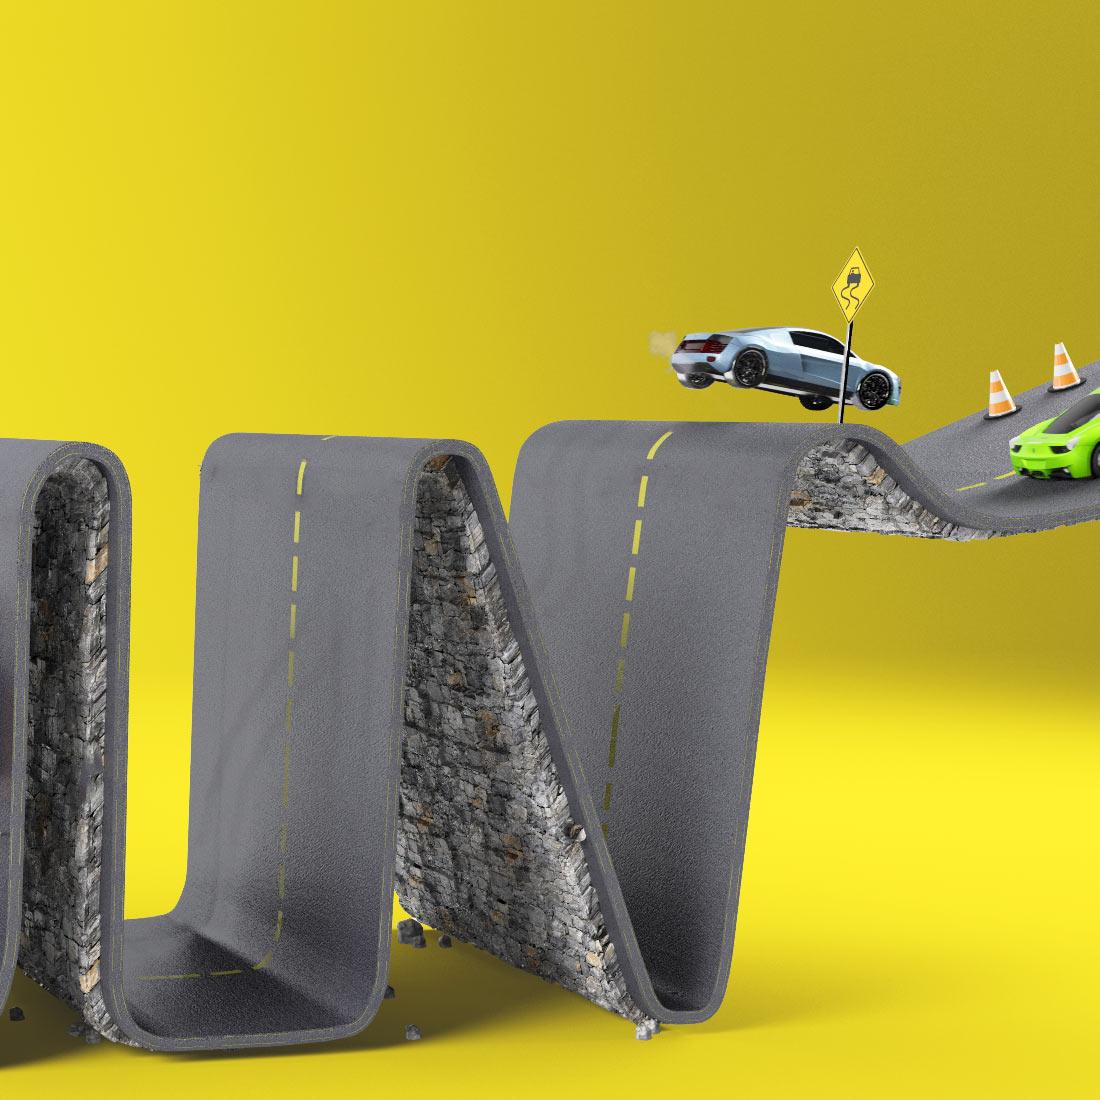 3DLETTERING CESS 3D 3DTYPE LETTERING CGI 3DARTIST ROAD CITY CAR